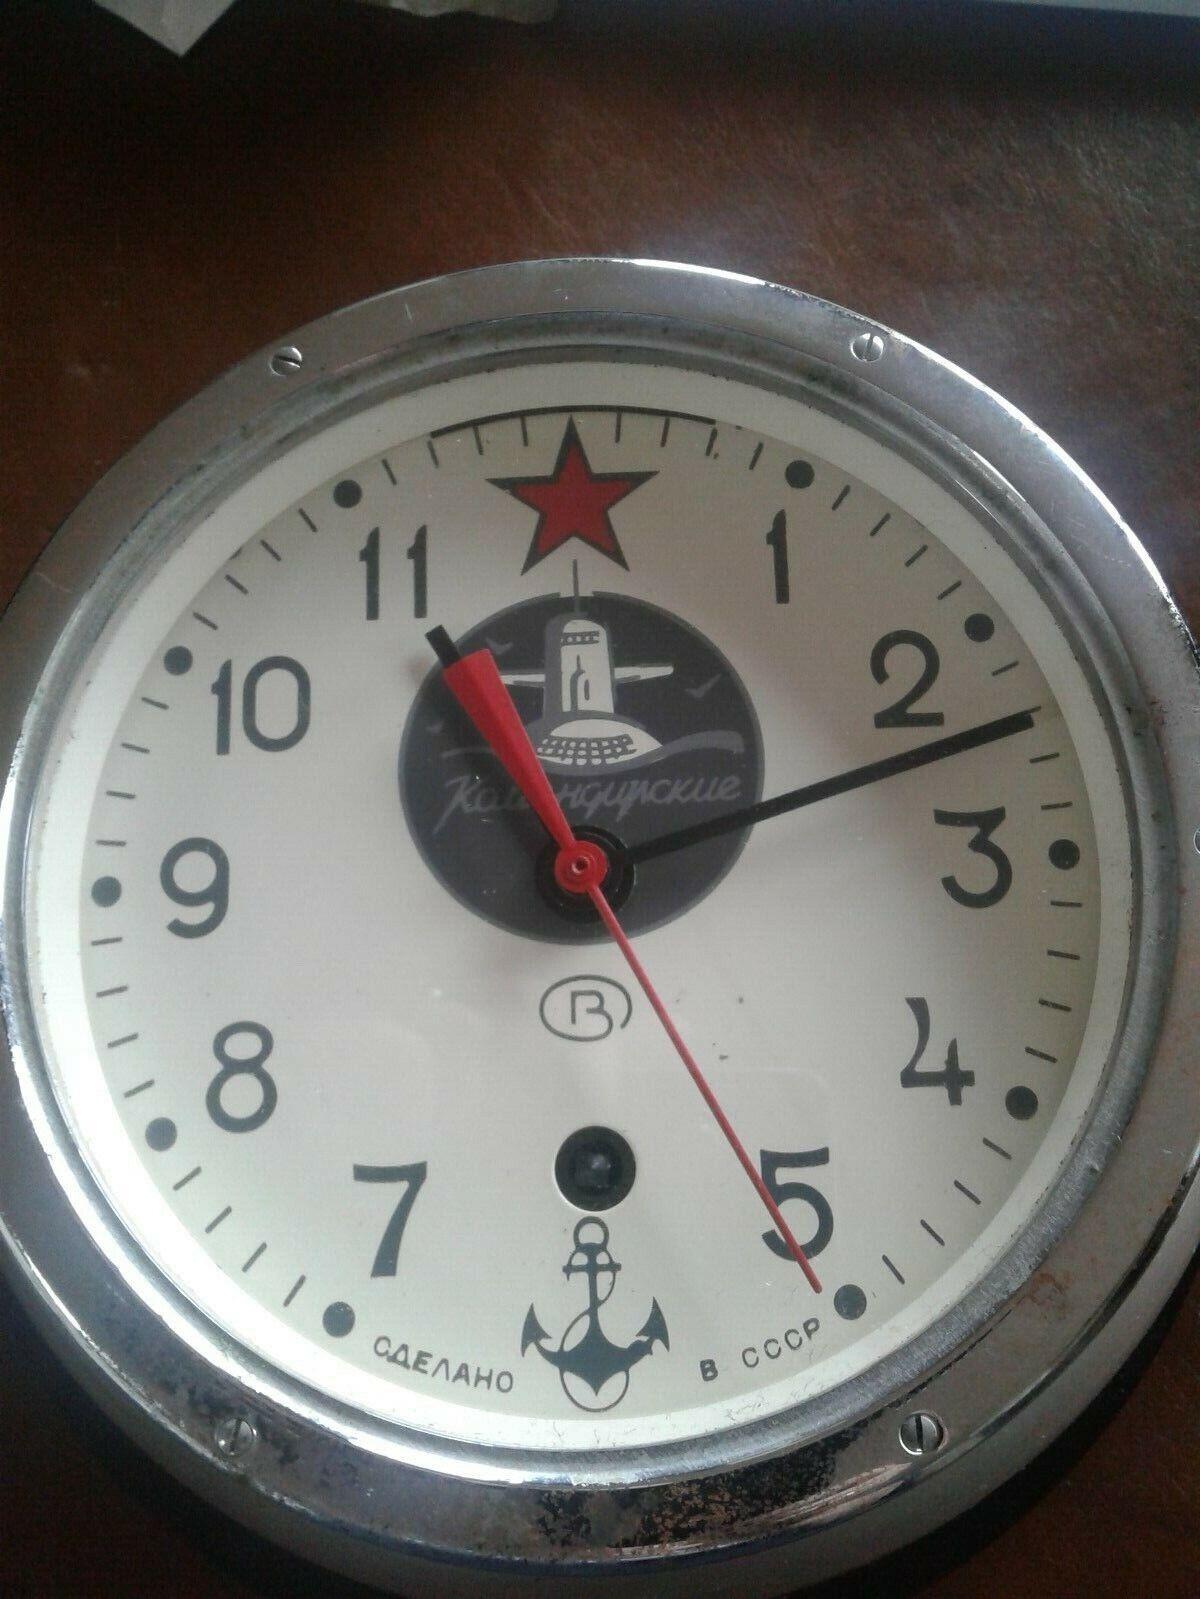 Vintage CCCP Cast Iron Submarine Working Clock - $135.00